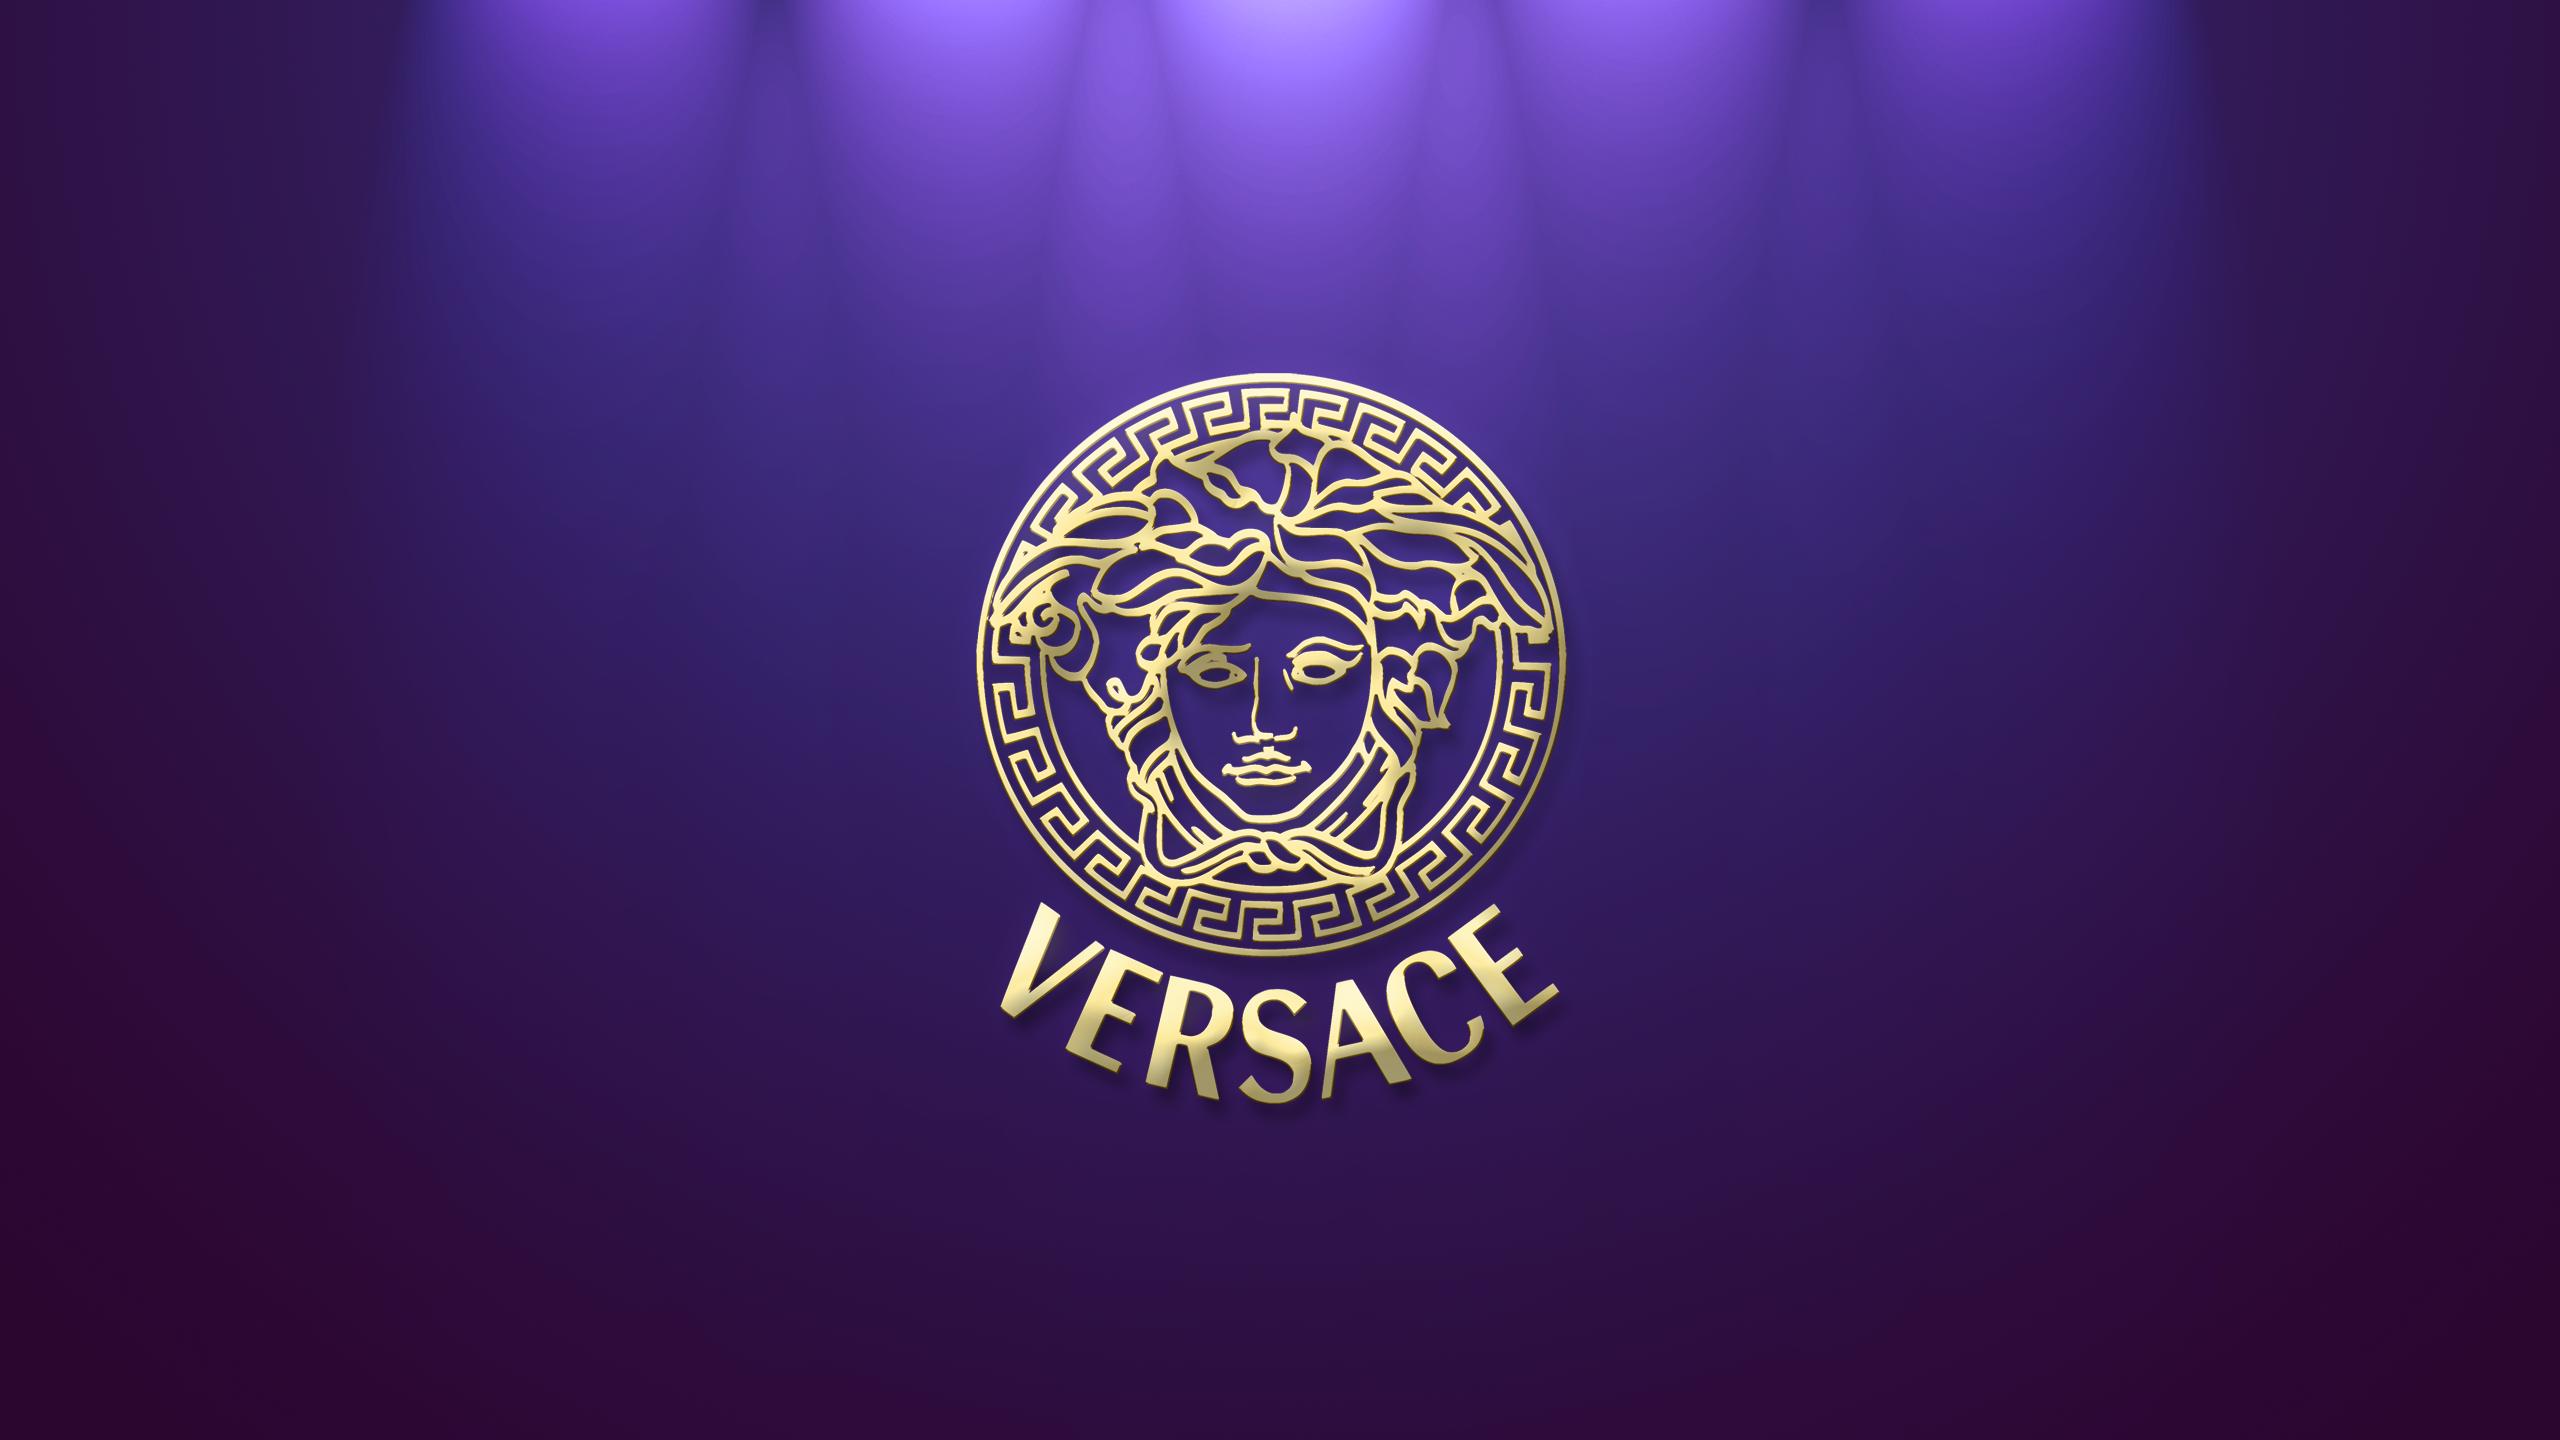 Versace HD Wallpaper -...